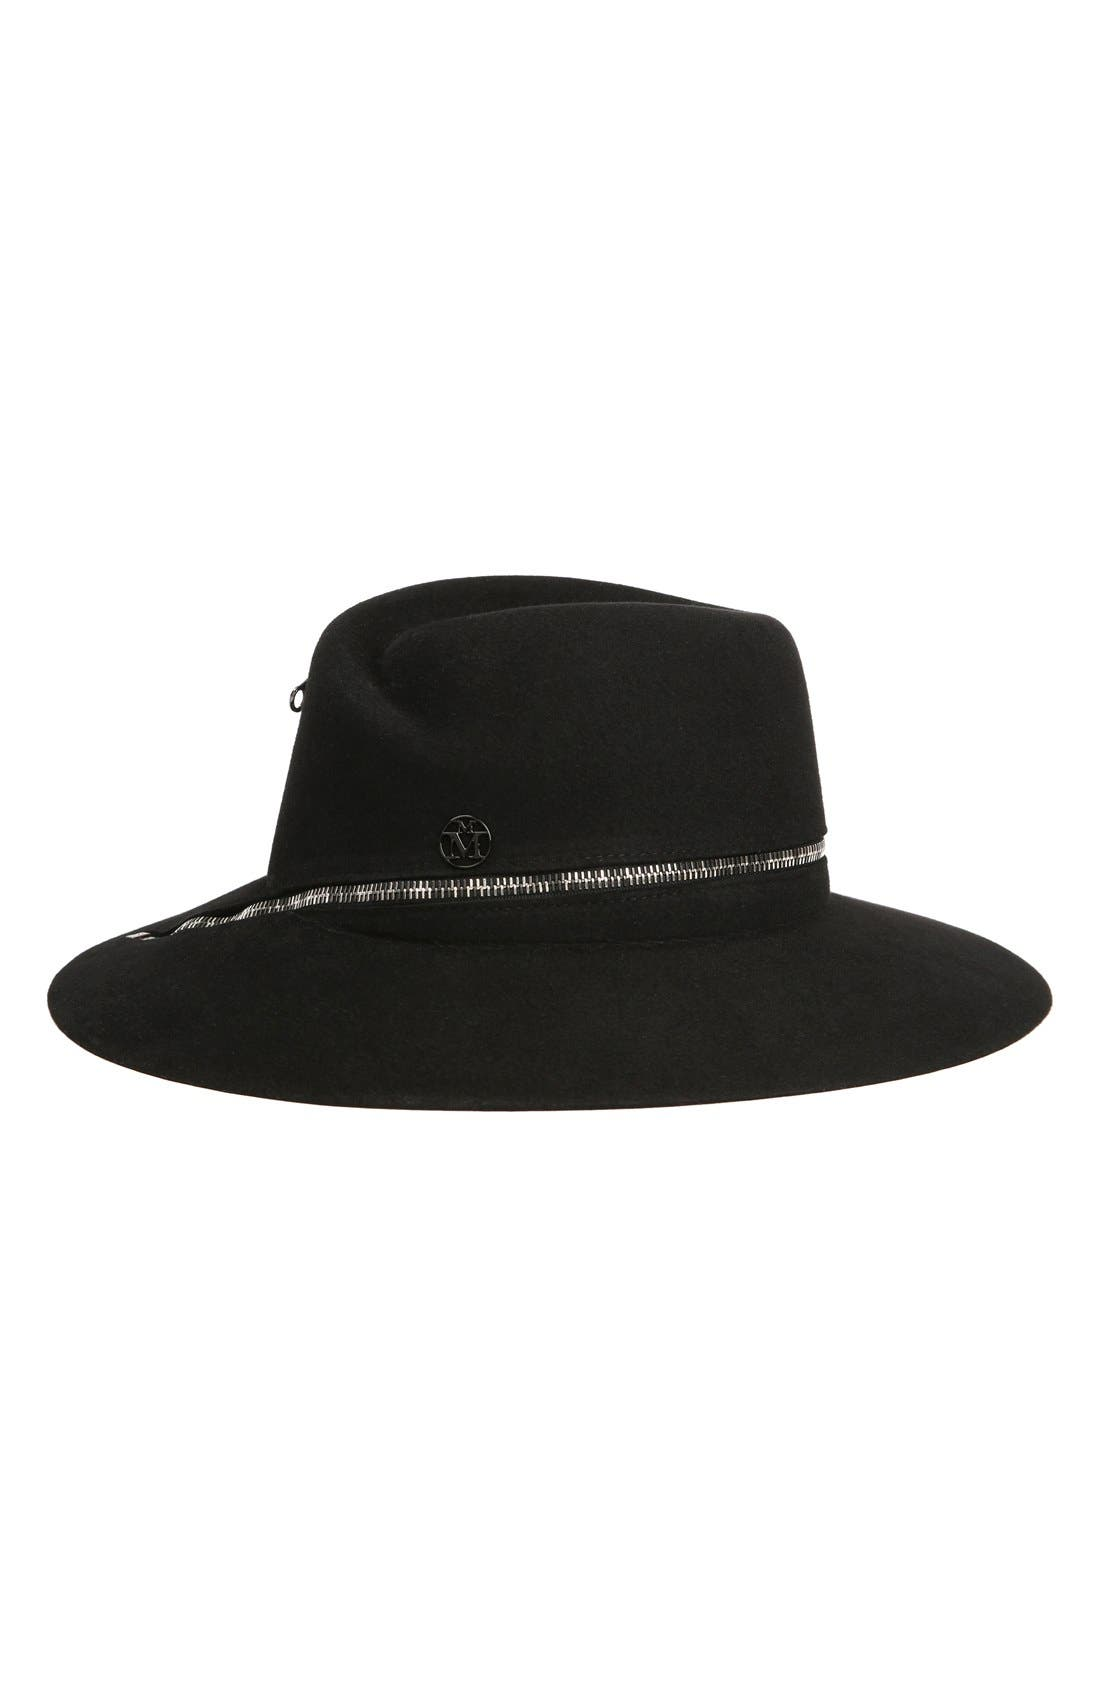 Virginie Fur Felt Hat,                         Main,                         color, 001